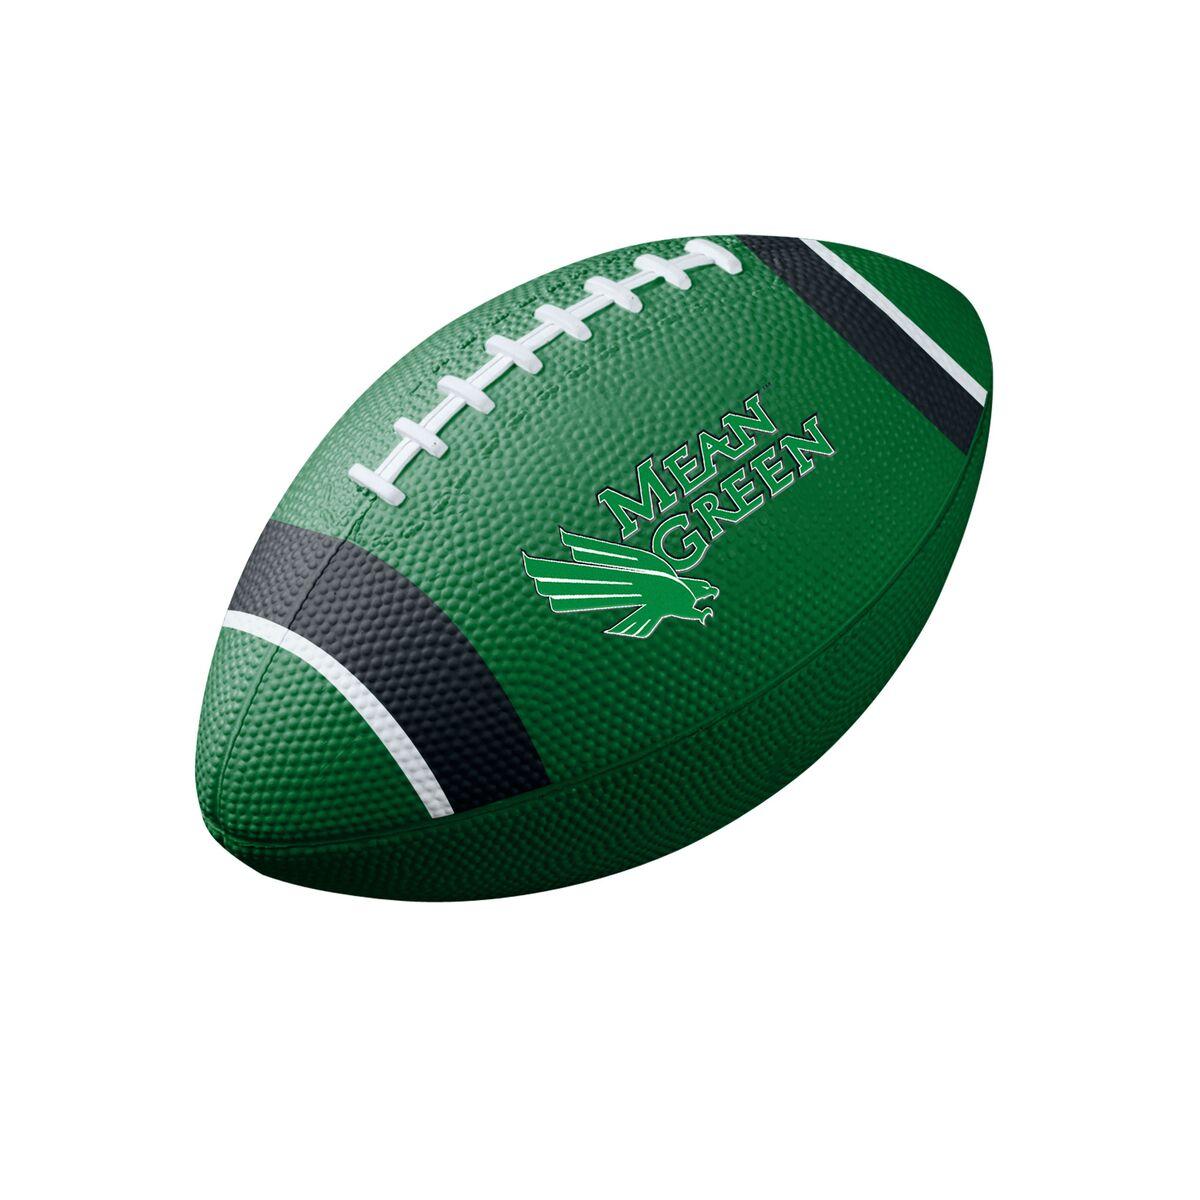 MINI MEAN GREEN NIKE FOOTBALL